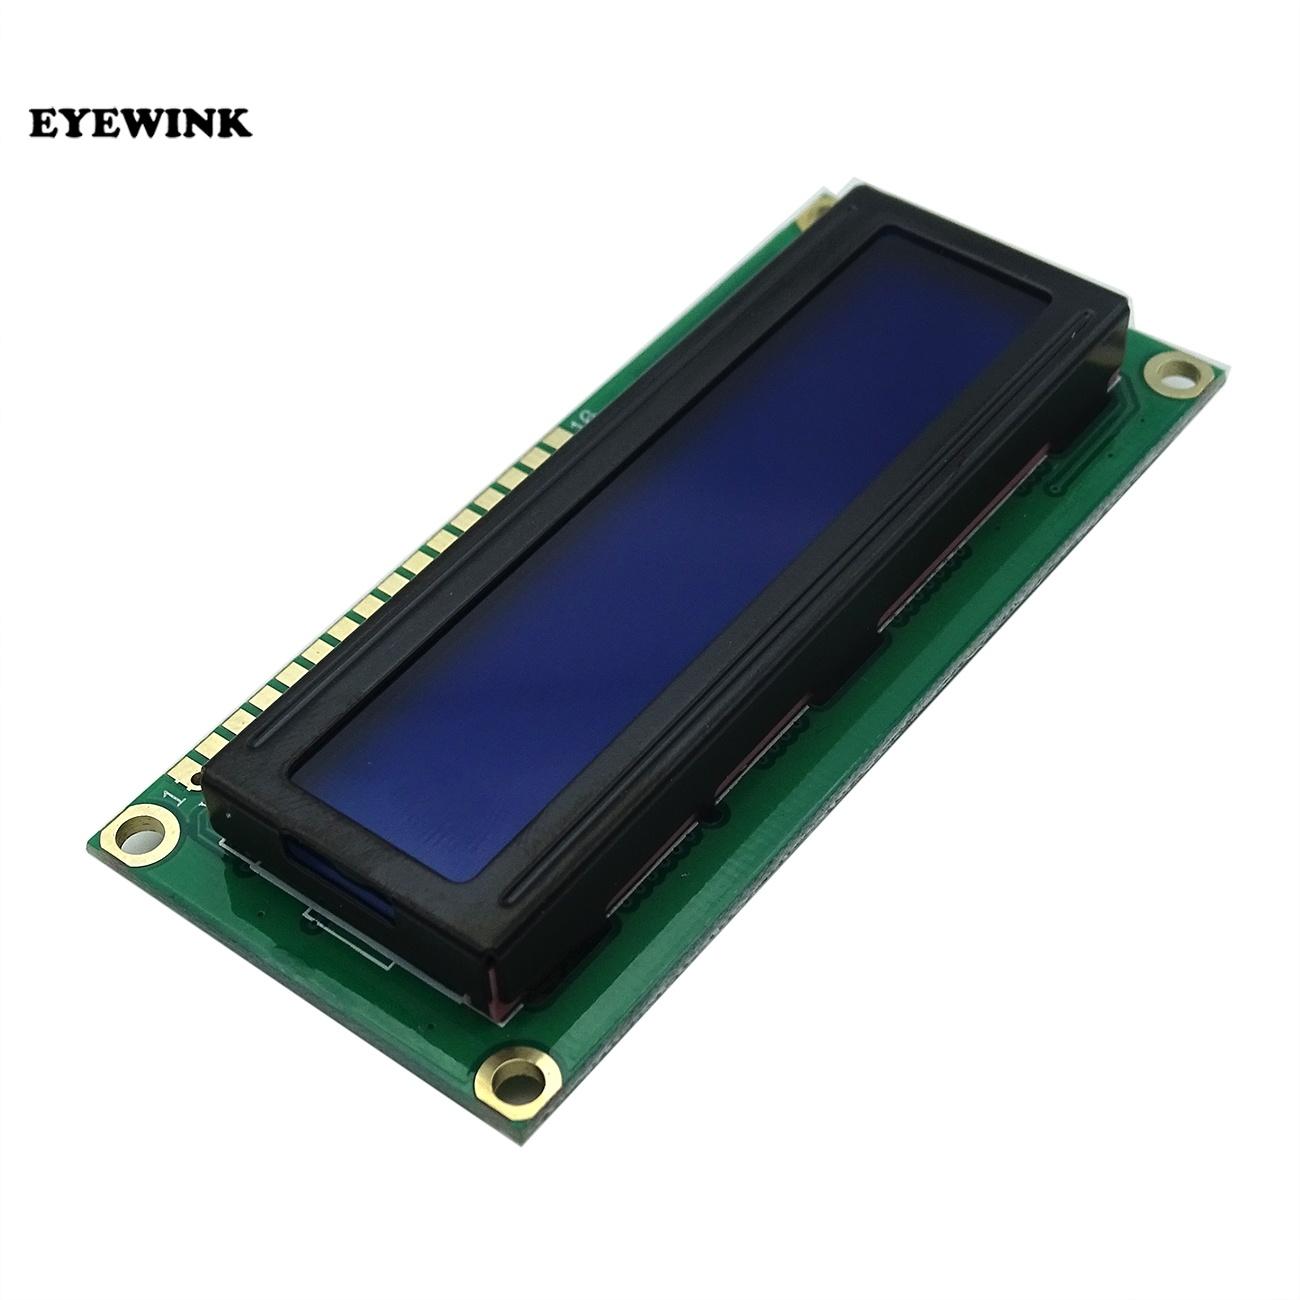 1pcs/lot 1602 16x2 Character LCD Display Module HD44780 Controller Blue/Green screen blacklight LCD1602 LCD monitor 1602 5V